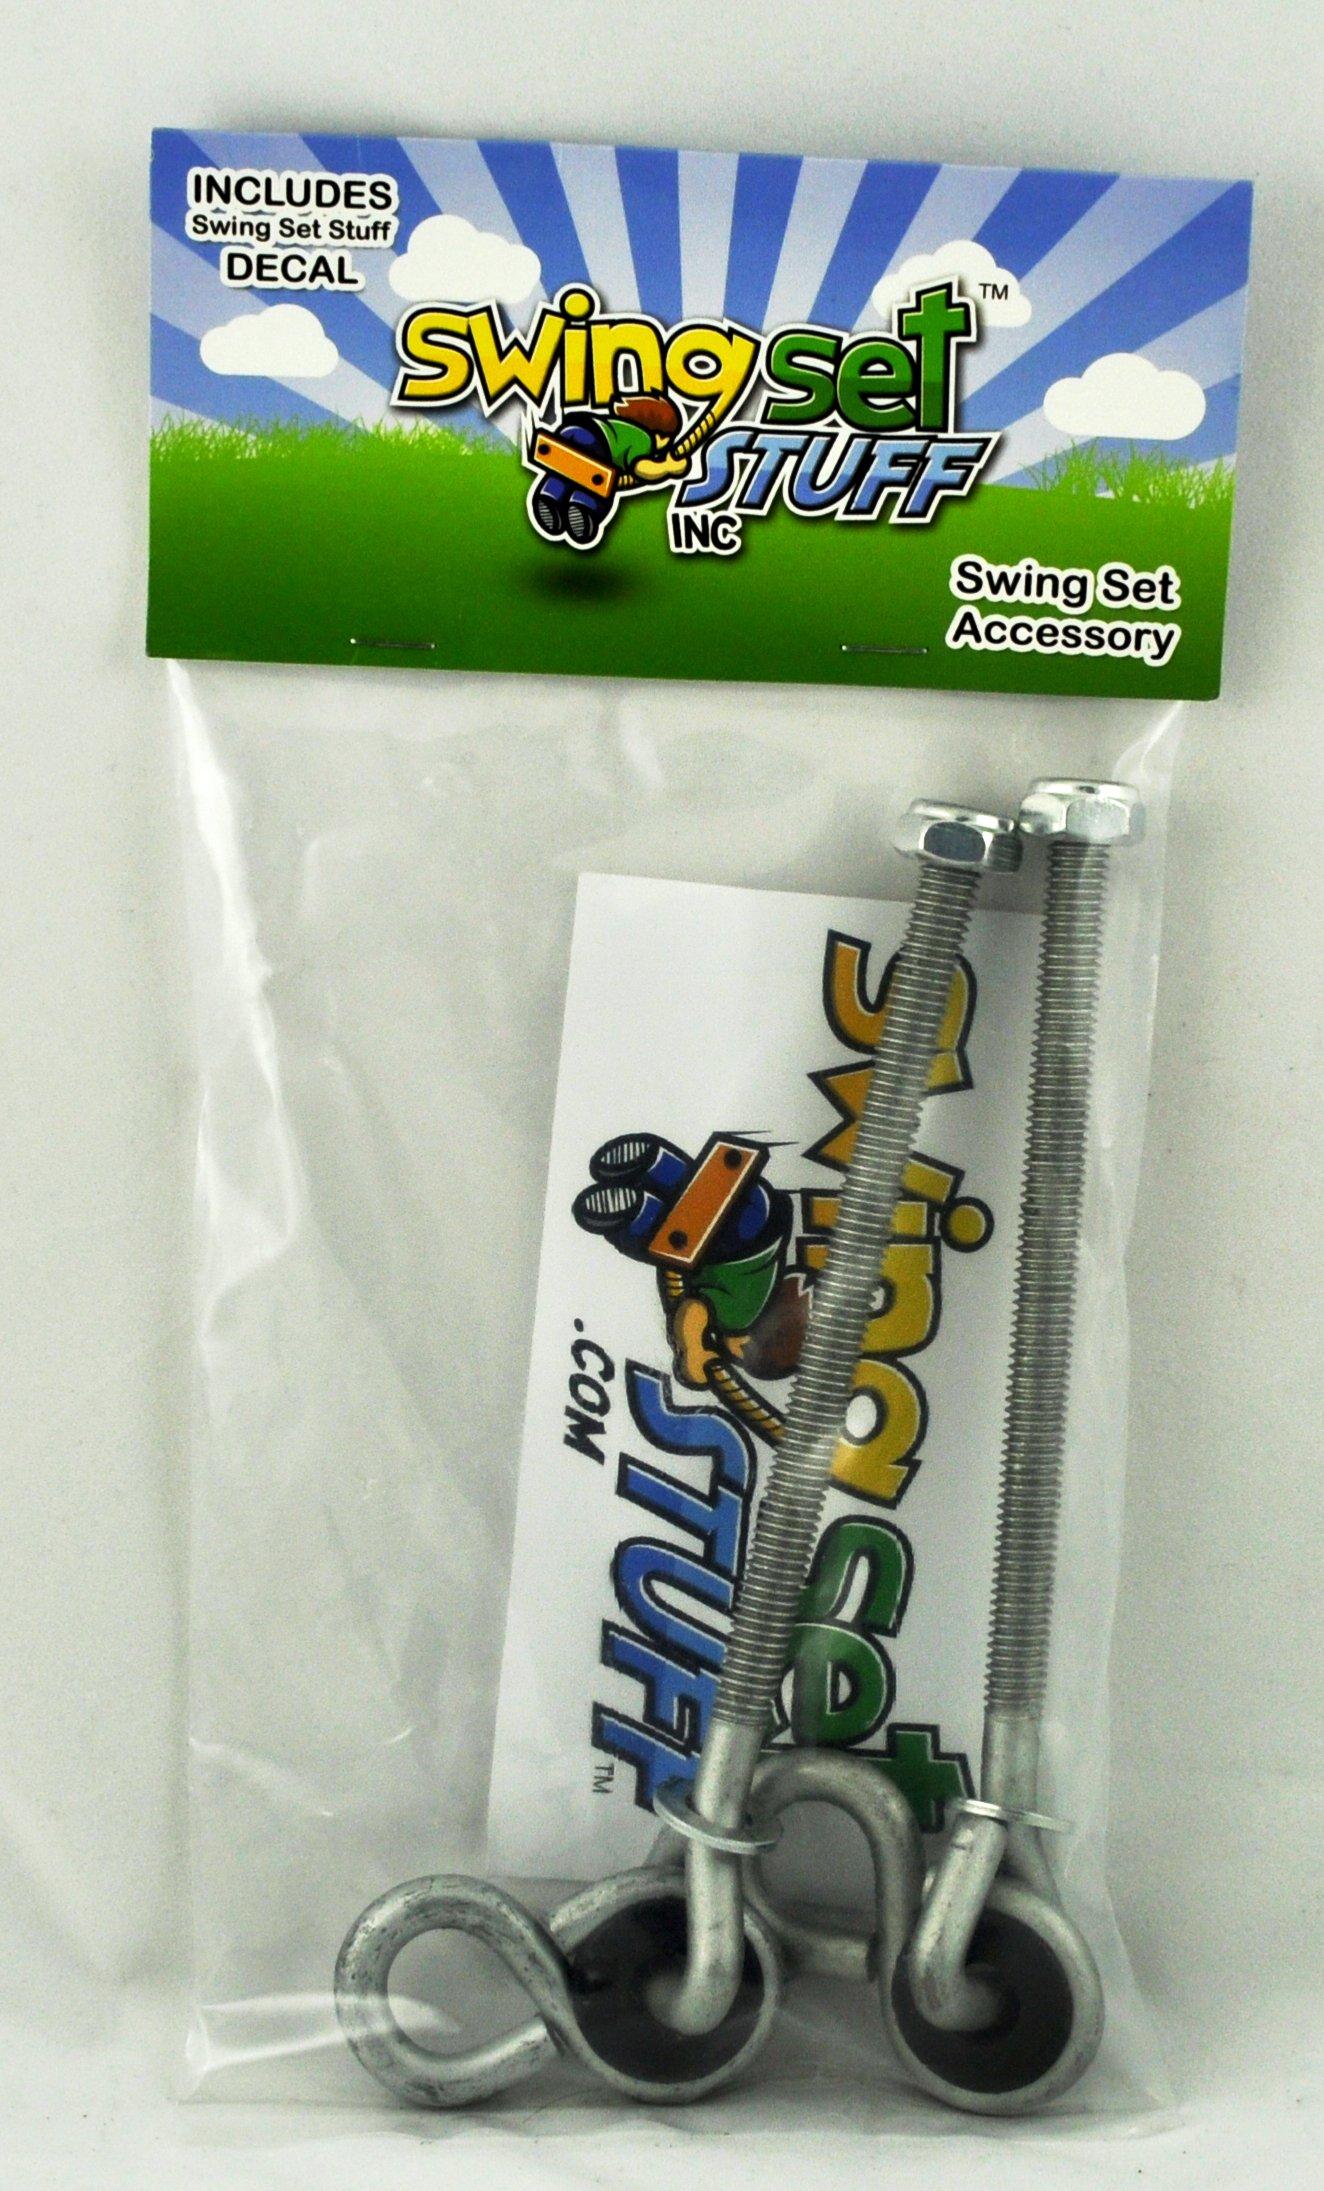 Swing Set Stuff 6'' x 3/8'' Nylon Bushing Swing Hanger (Pair) with SSS Logo Sticker